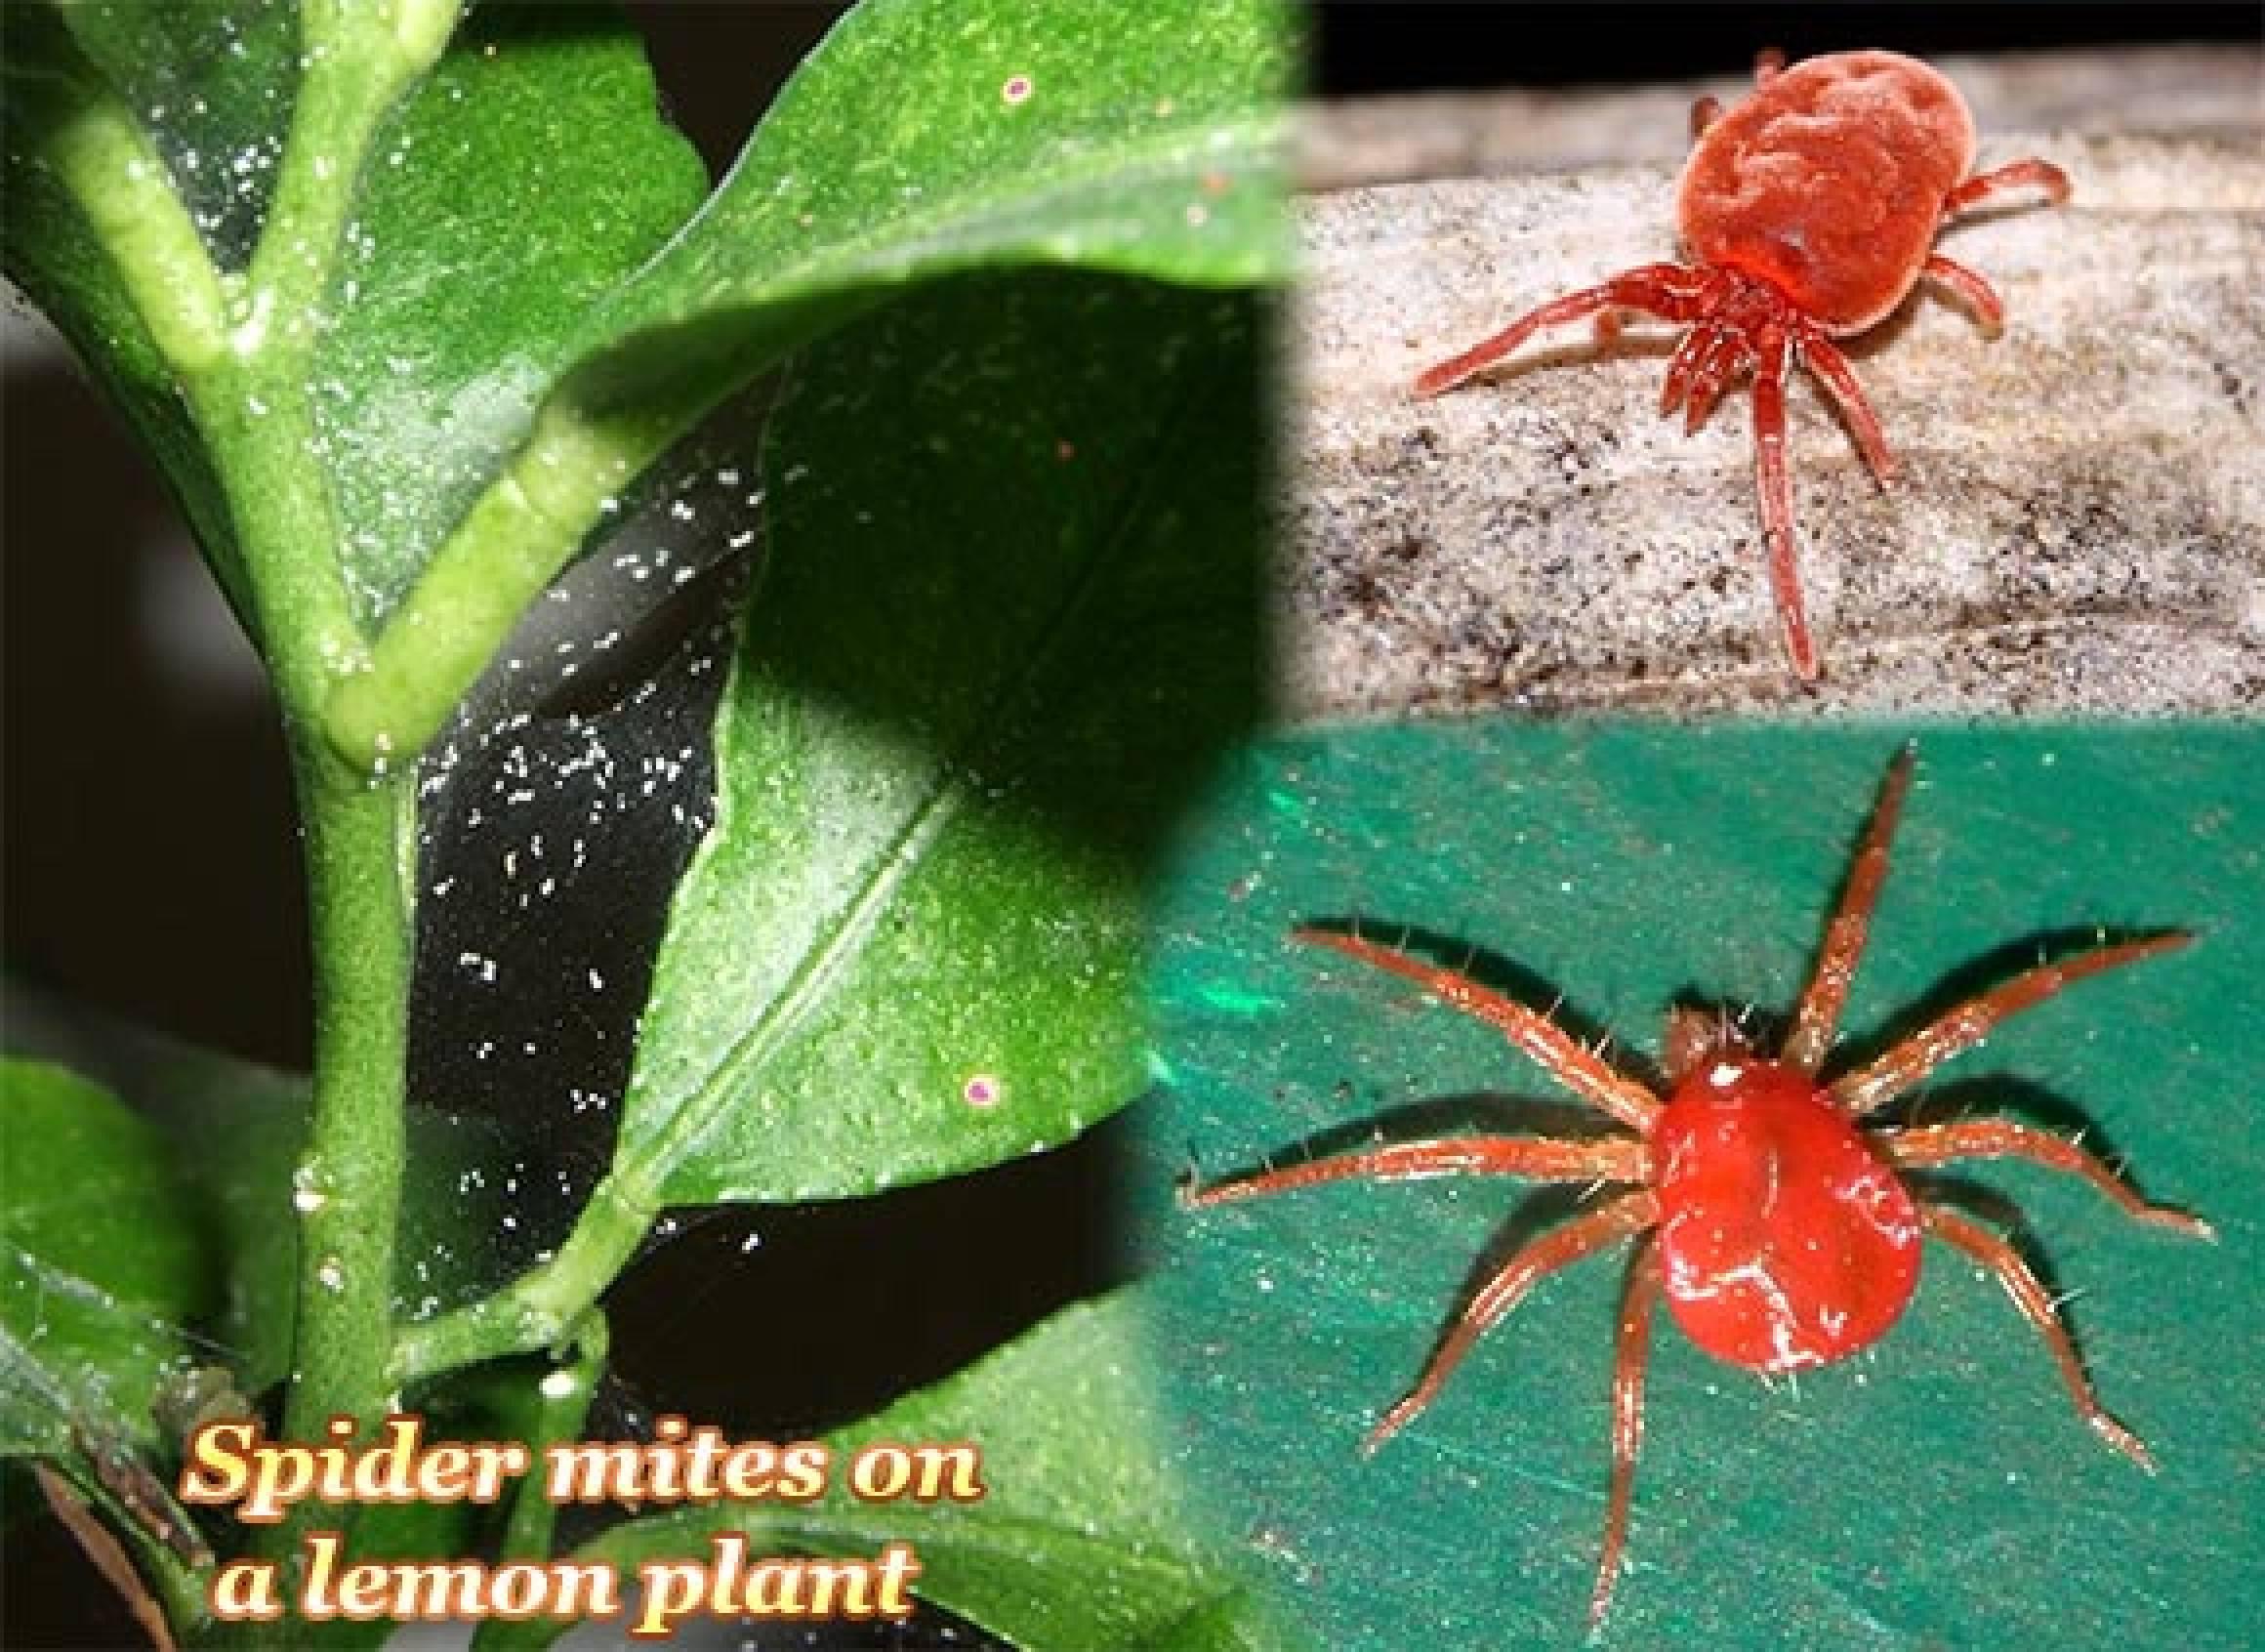 Termites It Takes Two To Make Love